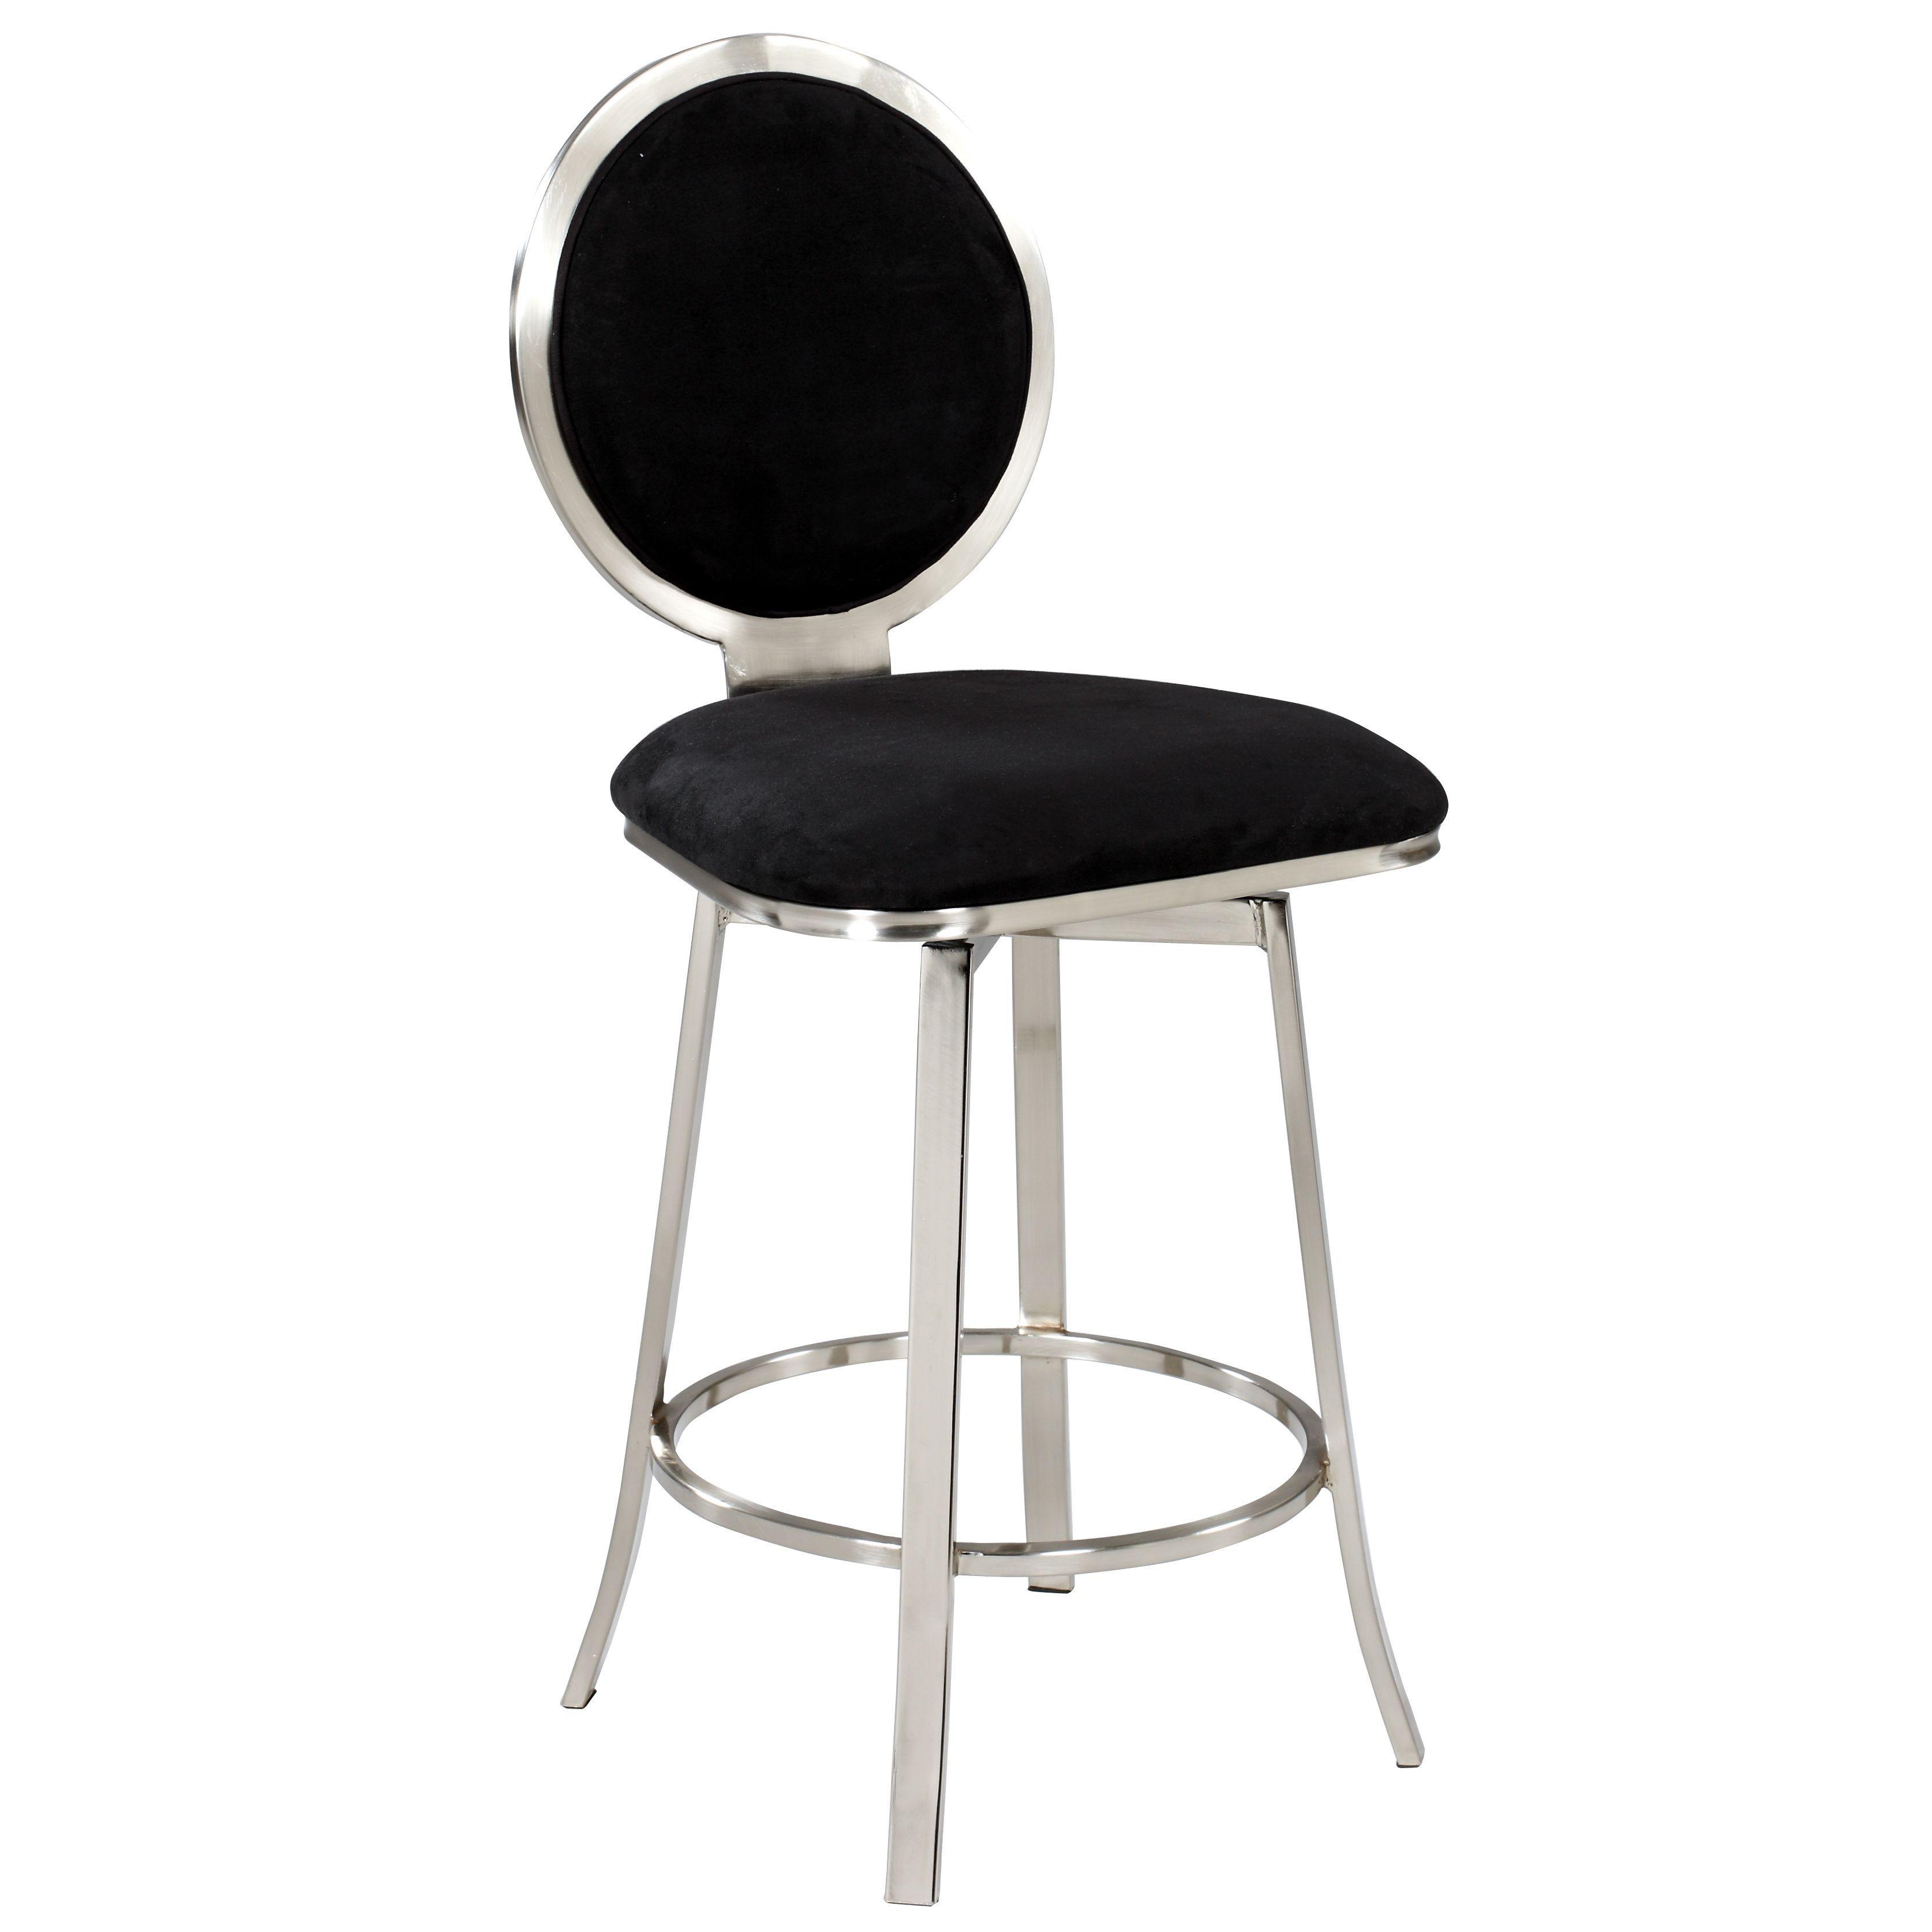 Online Shopping Bedding Furniture Electronics Jewelry Clothing More Swivel Counter Stools Swivel Bar Stools Bar Stools